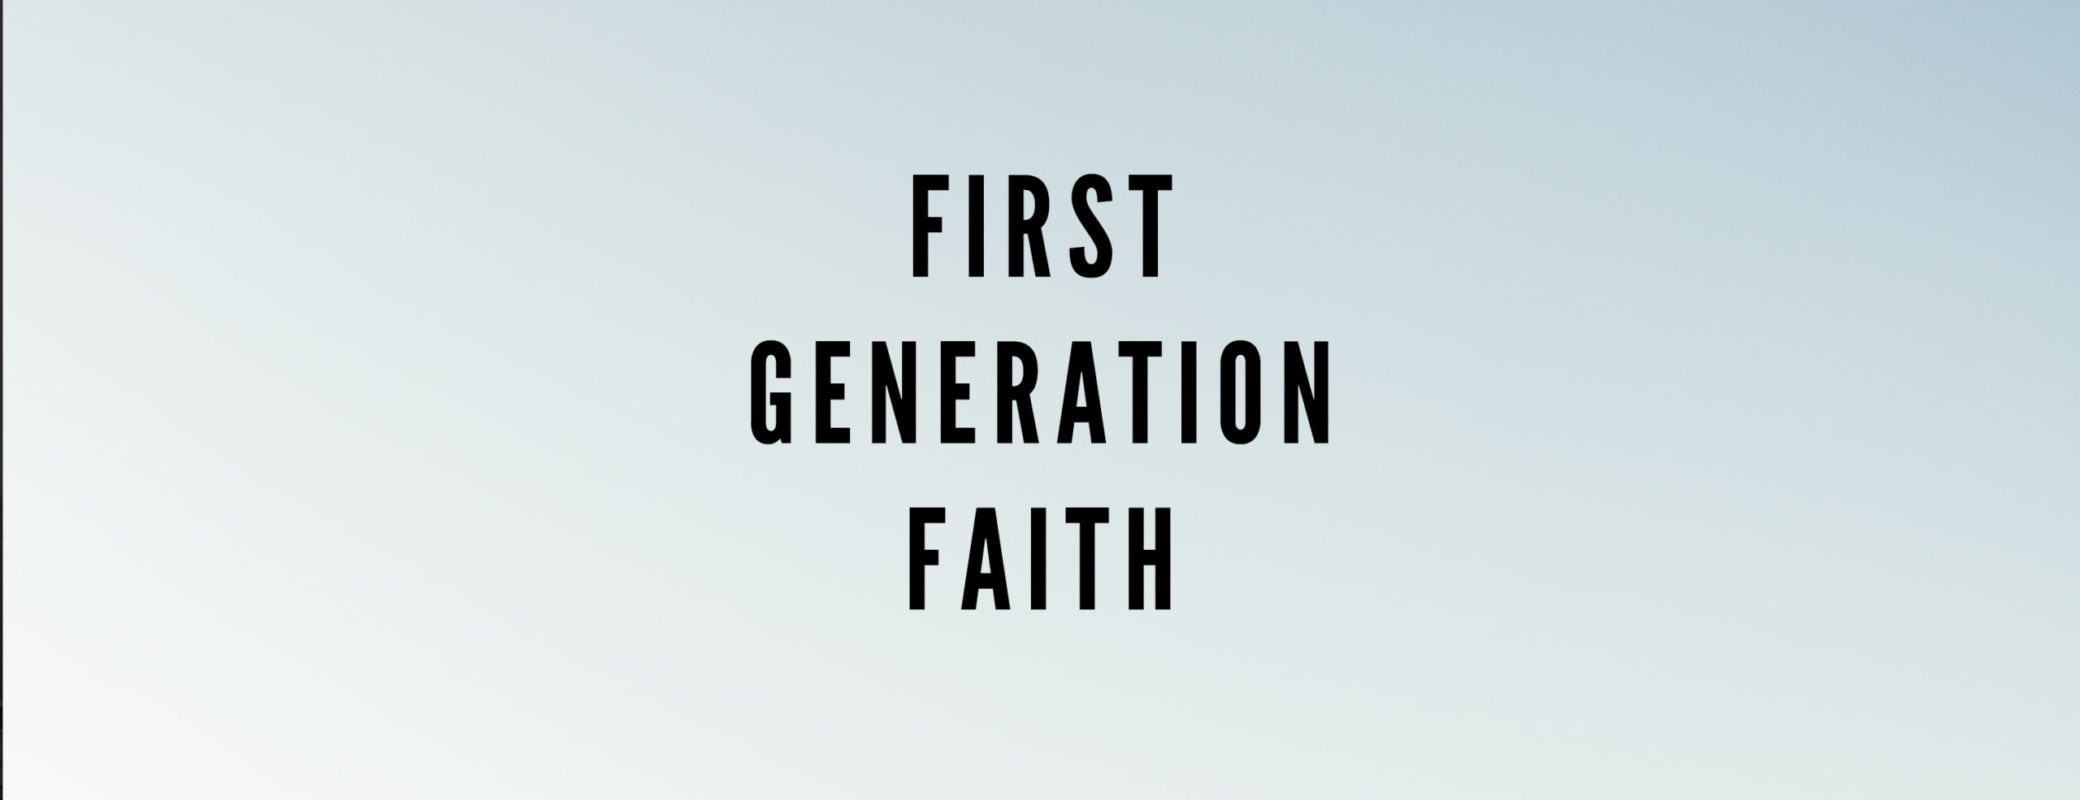 FIRST GENERATION FAITH